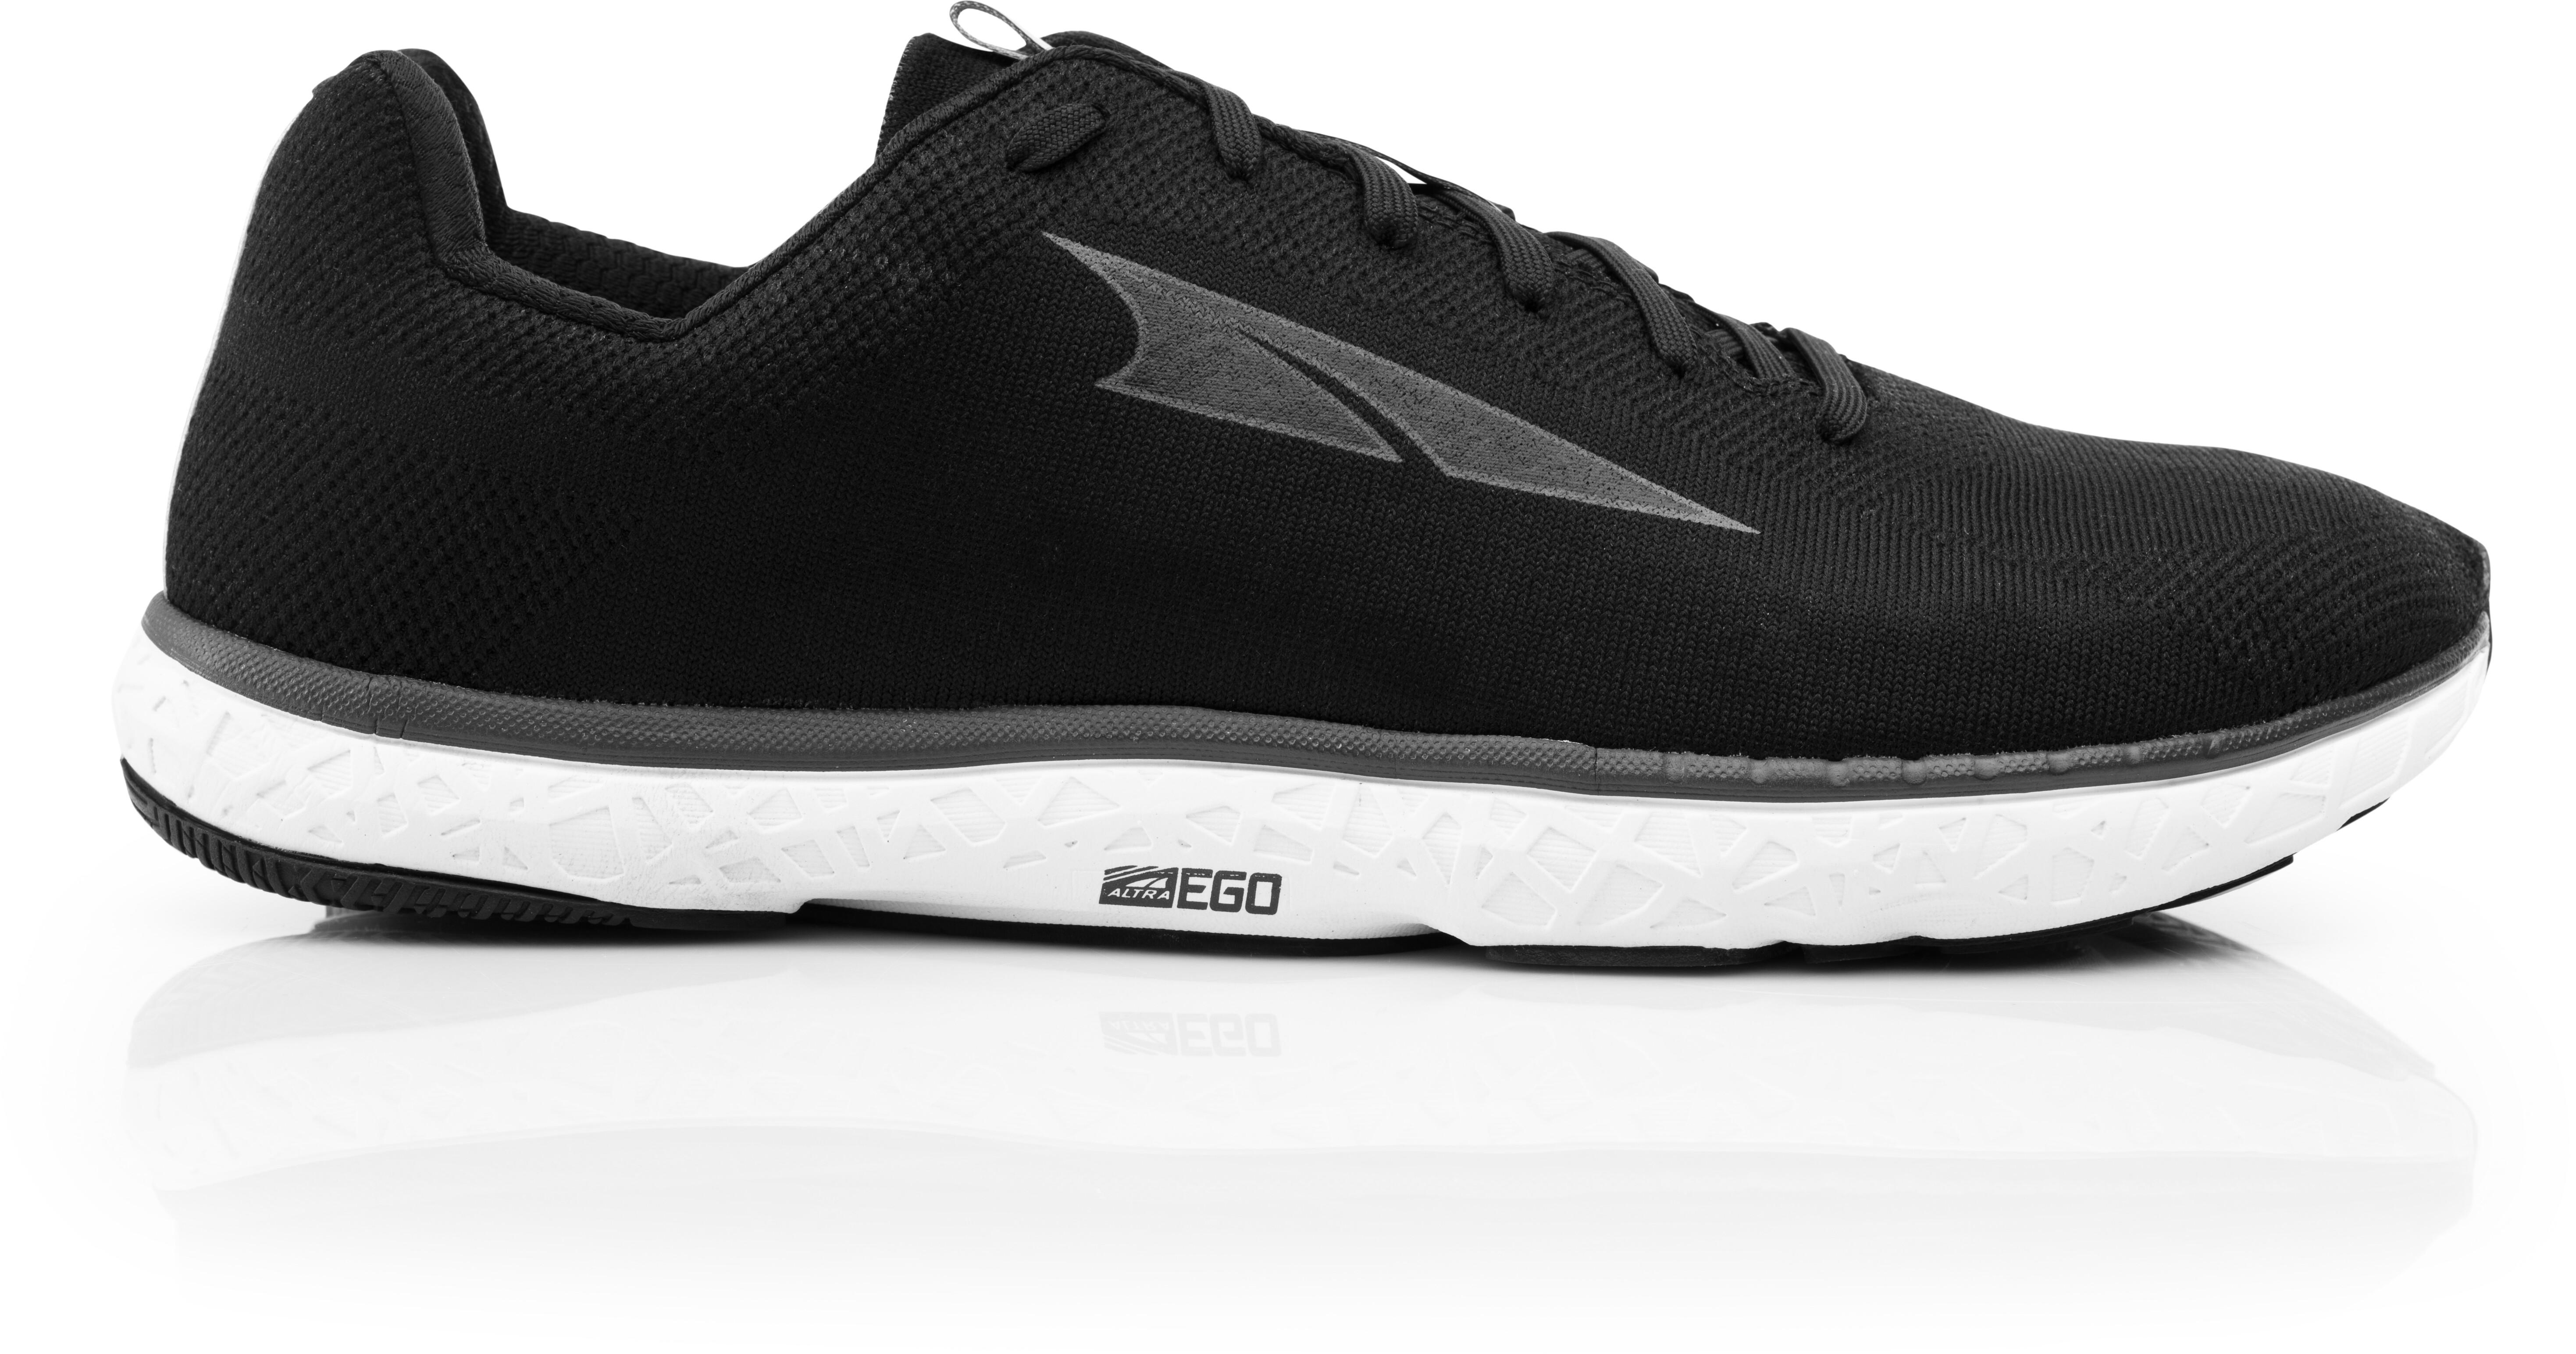 ebcb5f5362 Altra Escalante 1.5 Running Shoes Herren black/white   campz.at